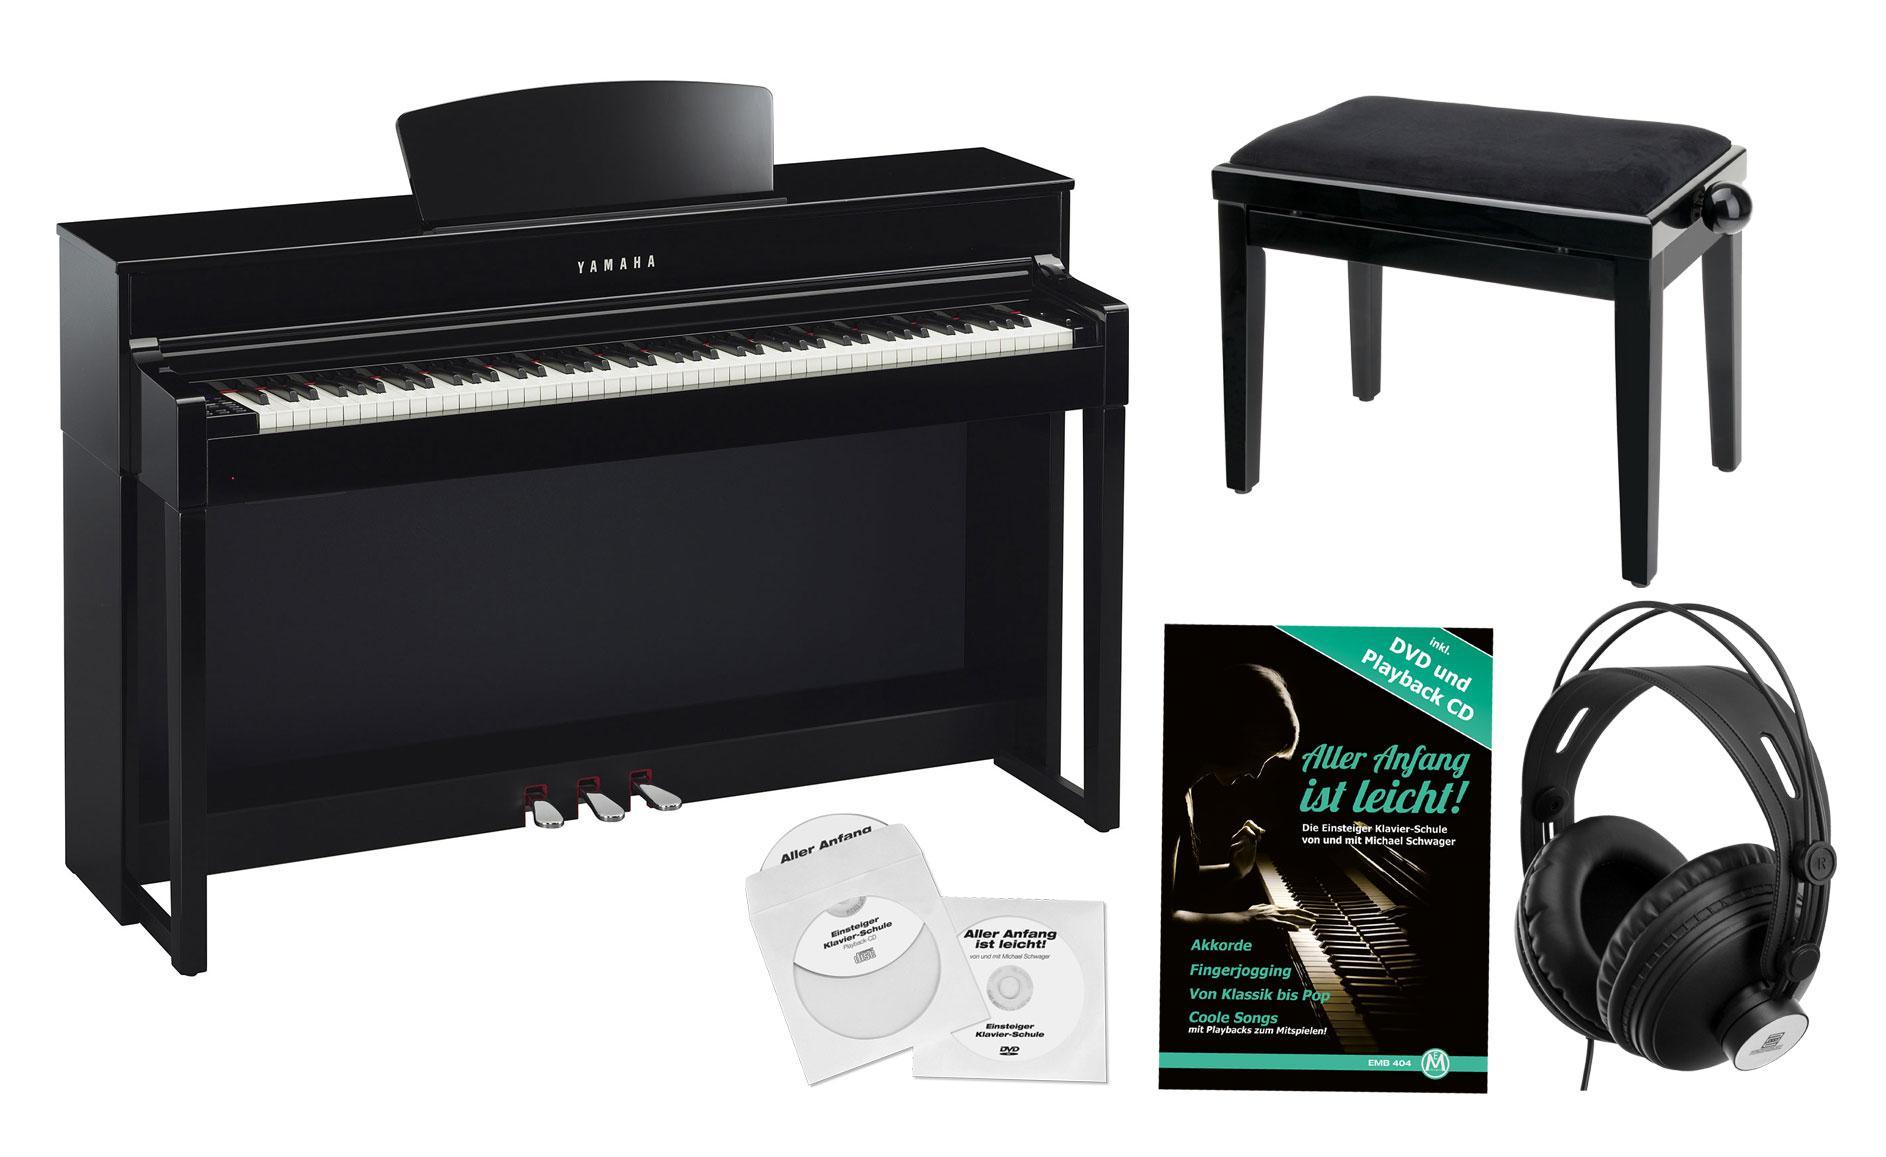 Yamaha clp 535 pe digitalpiano schwarz hochglanz set for Yamaha digital piano clp 535